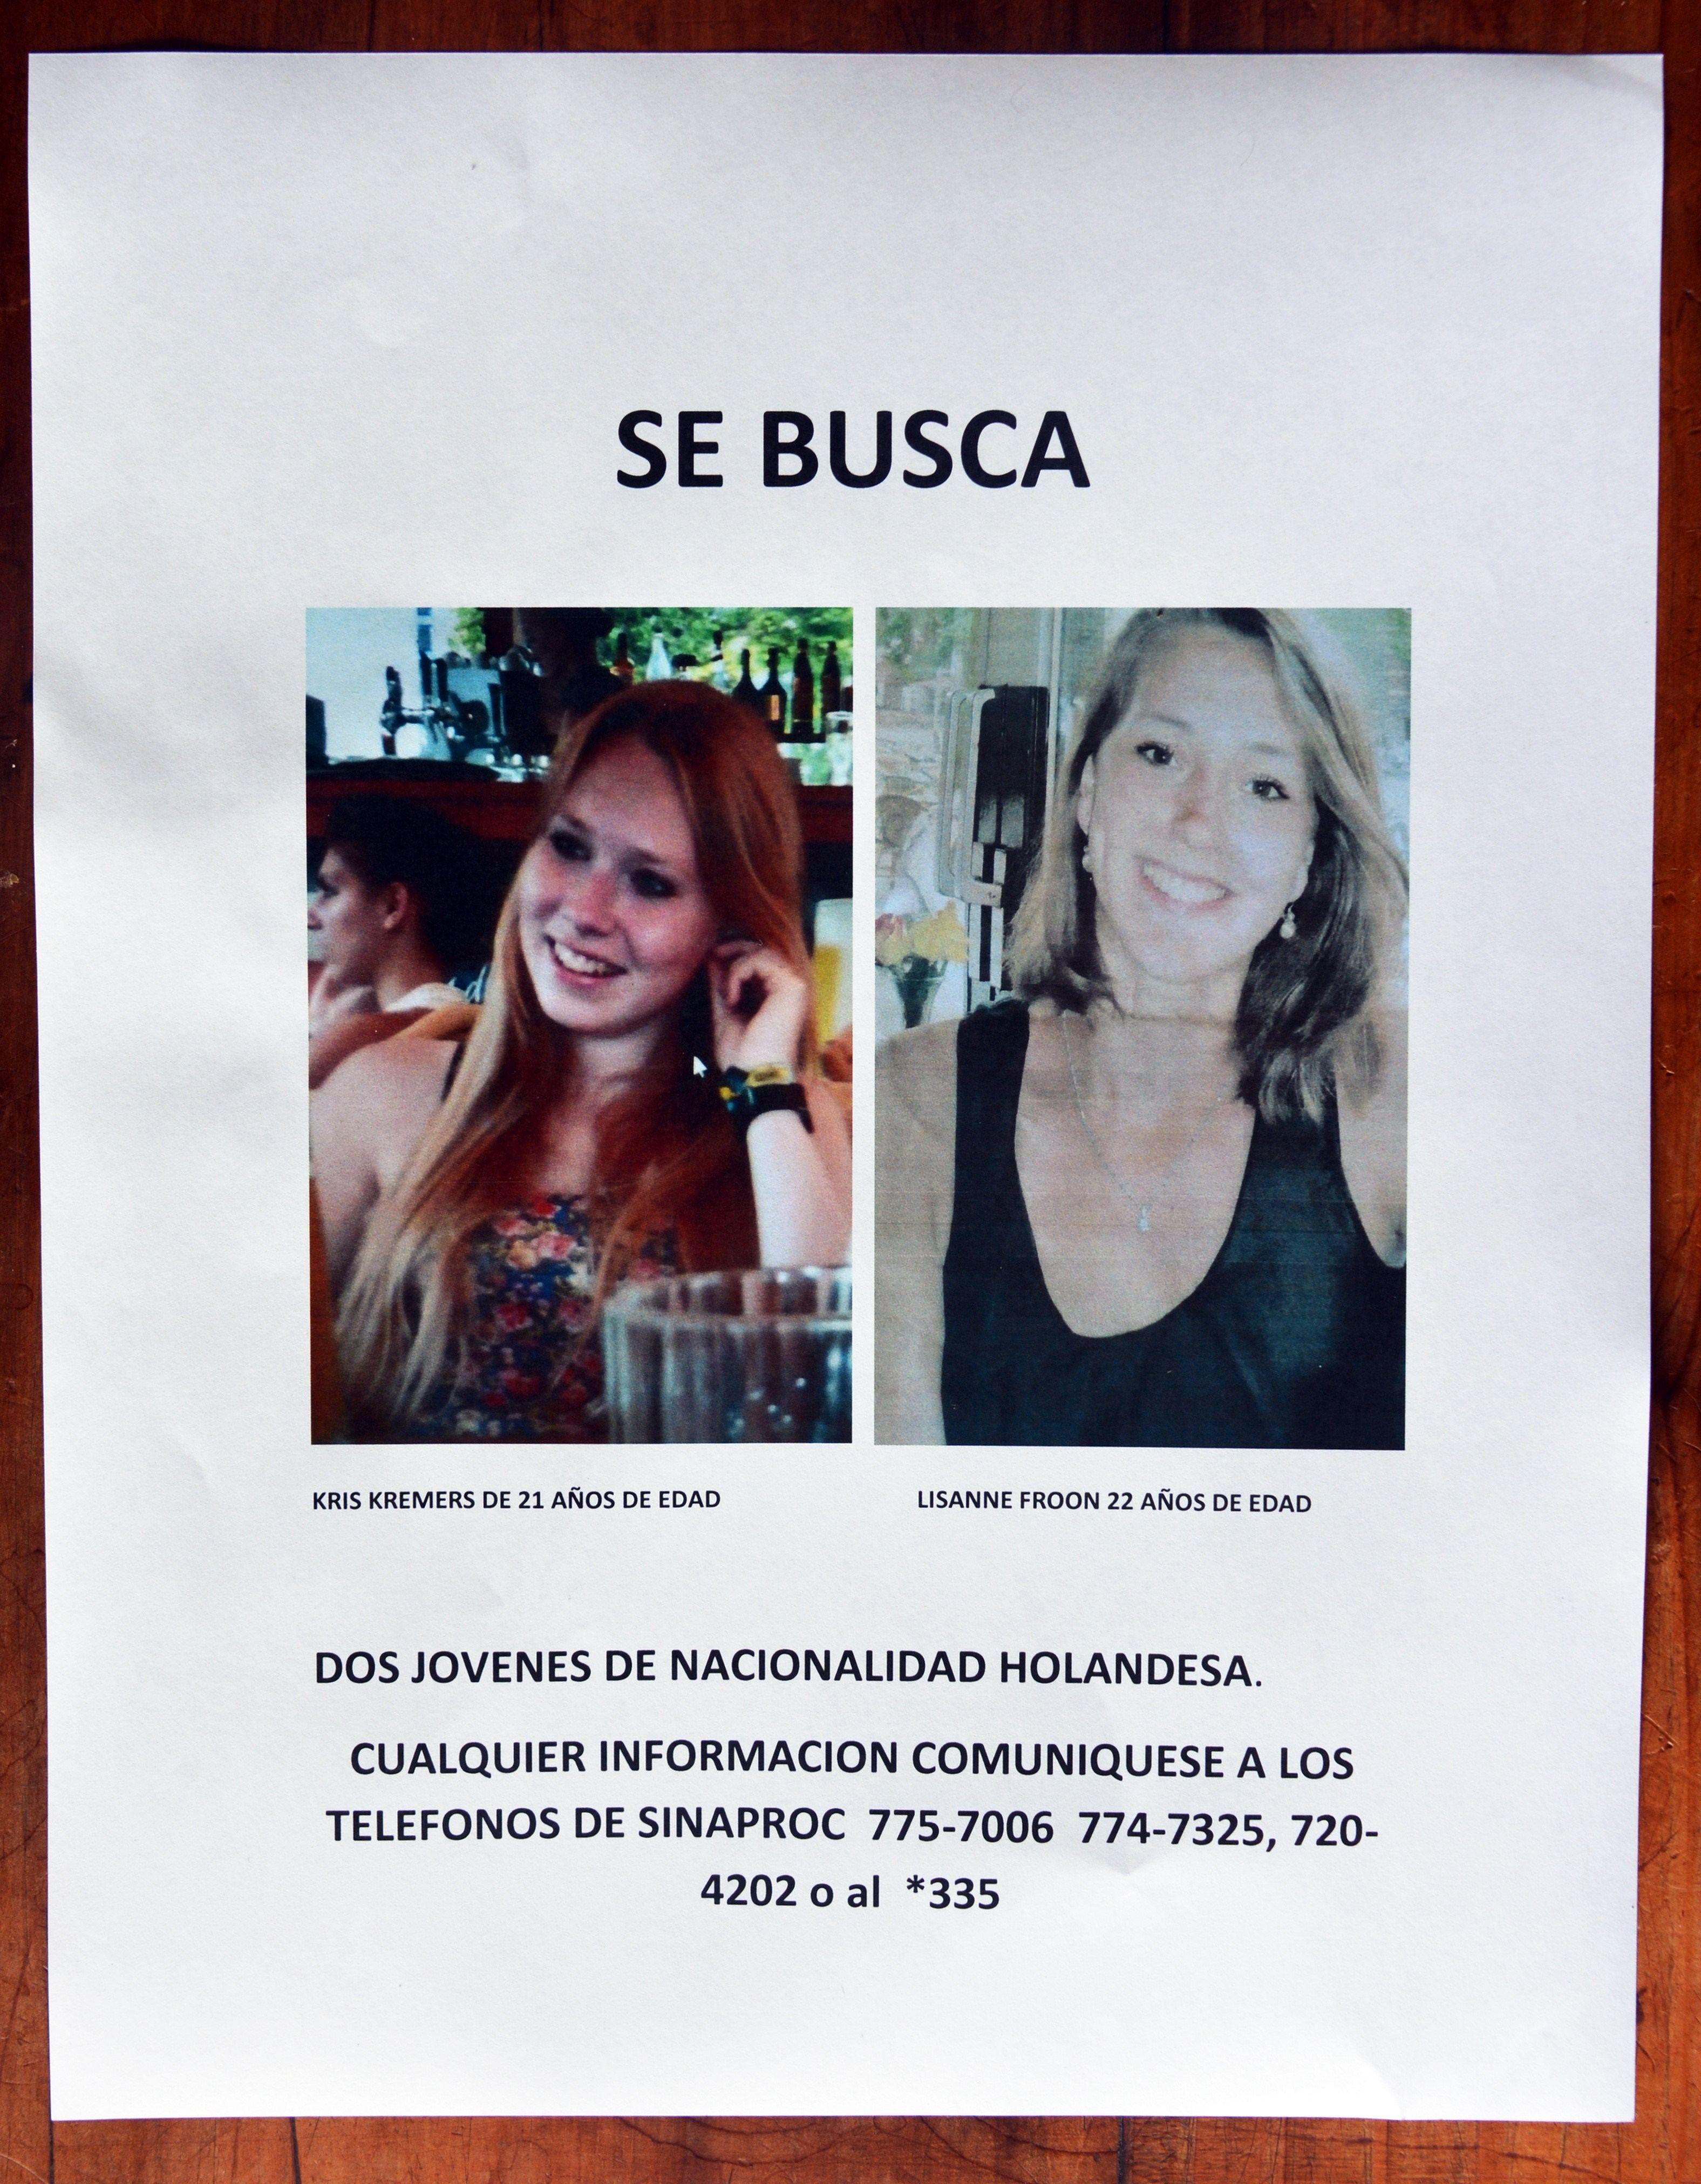 Dutch hikers missing in Panama